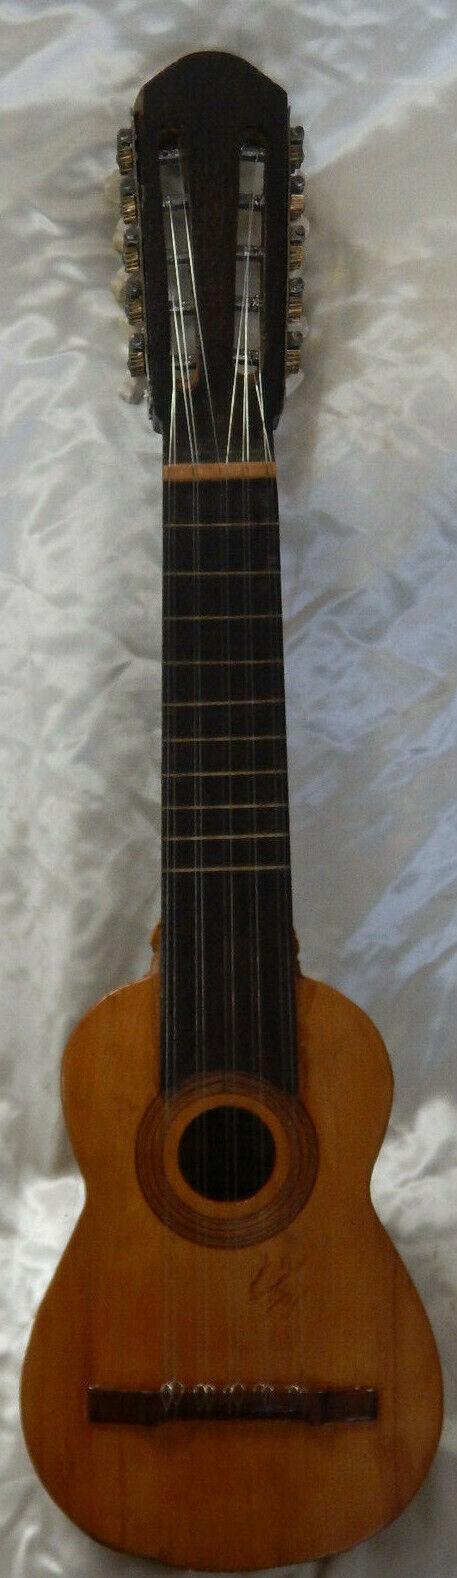 Klassisches traditionelles Charango Original Armadillo 10 Saiteninstrument